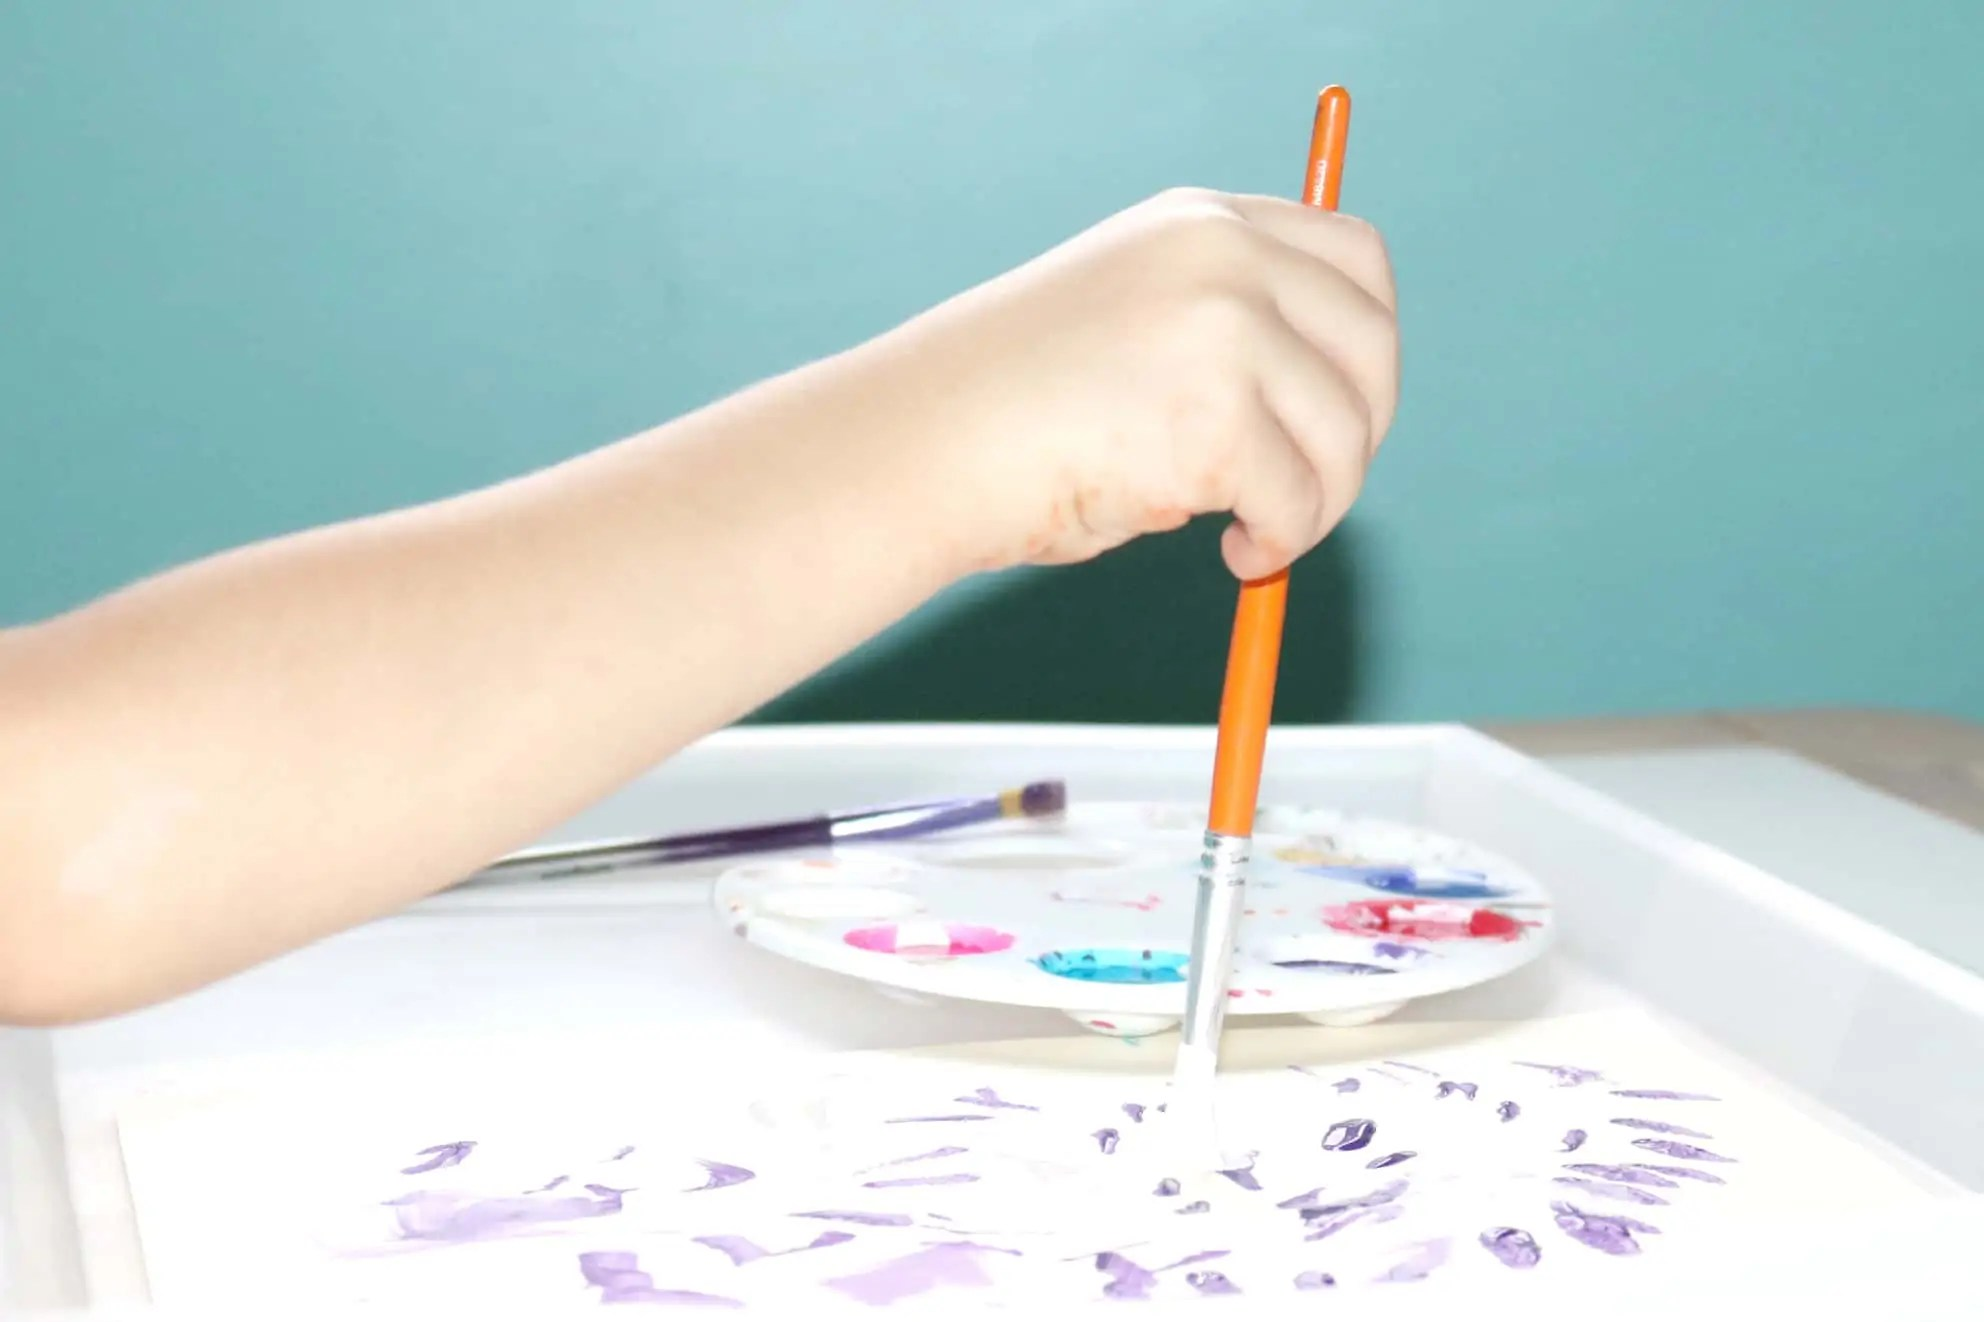 Dancing Paintbrush Process Art 4